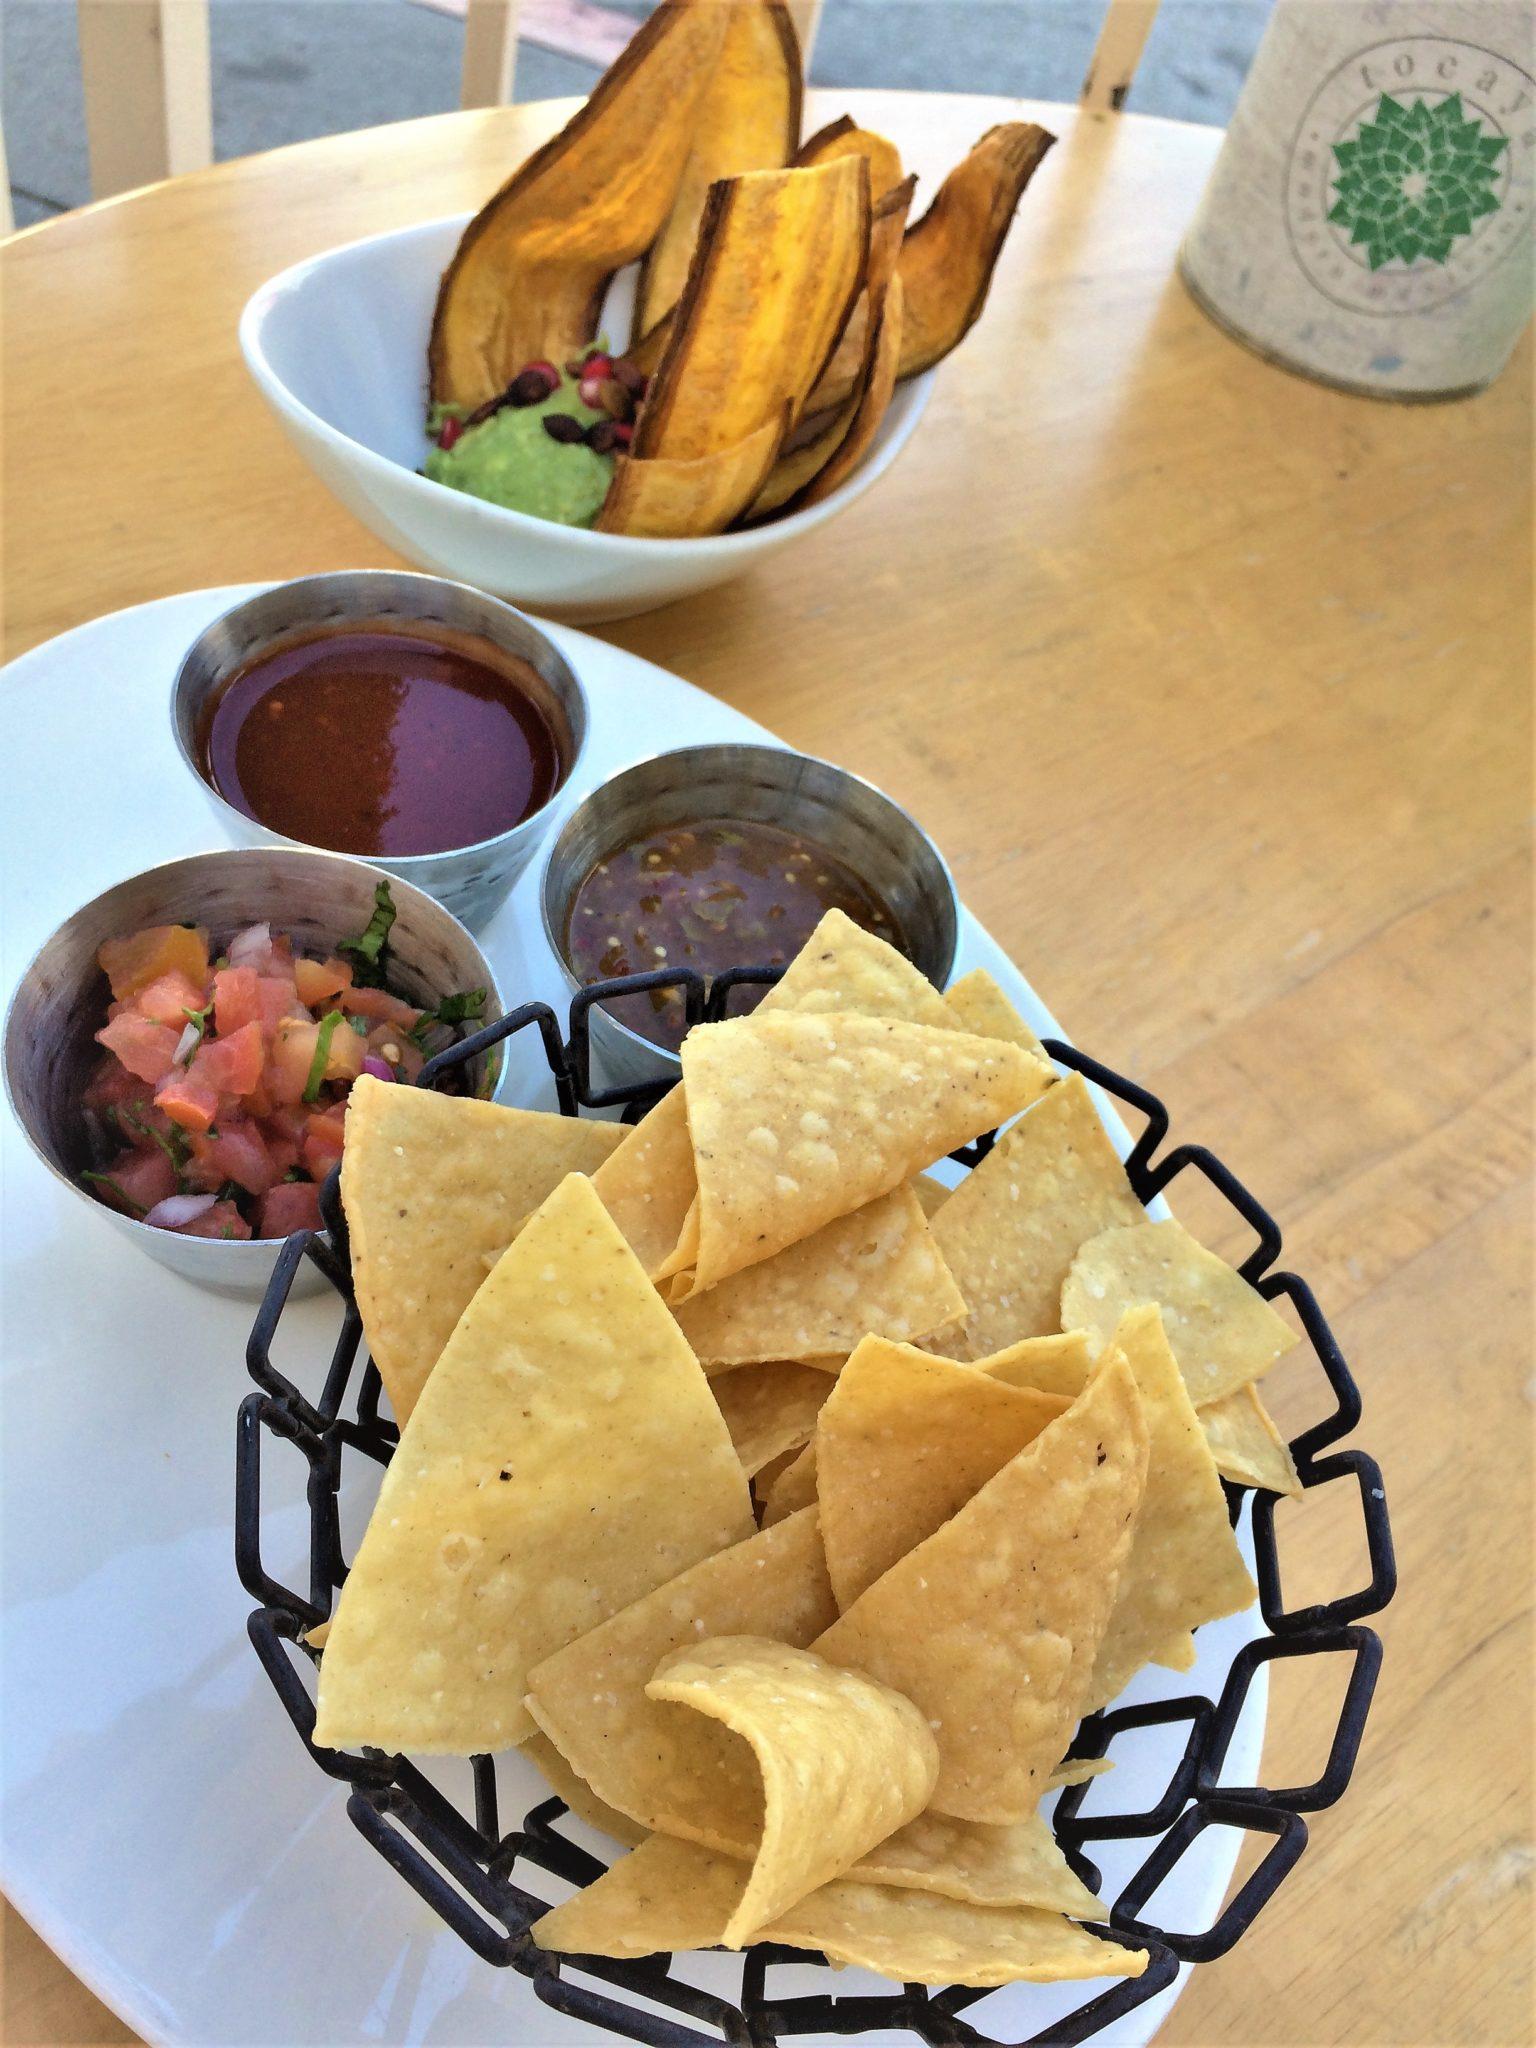 Vegan restaurants Los Angeles, Tocaya Organica, California, Chips and guac